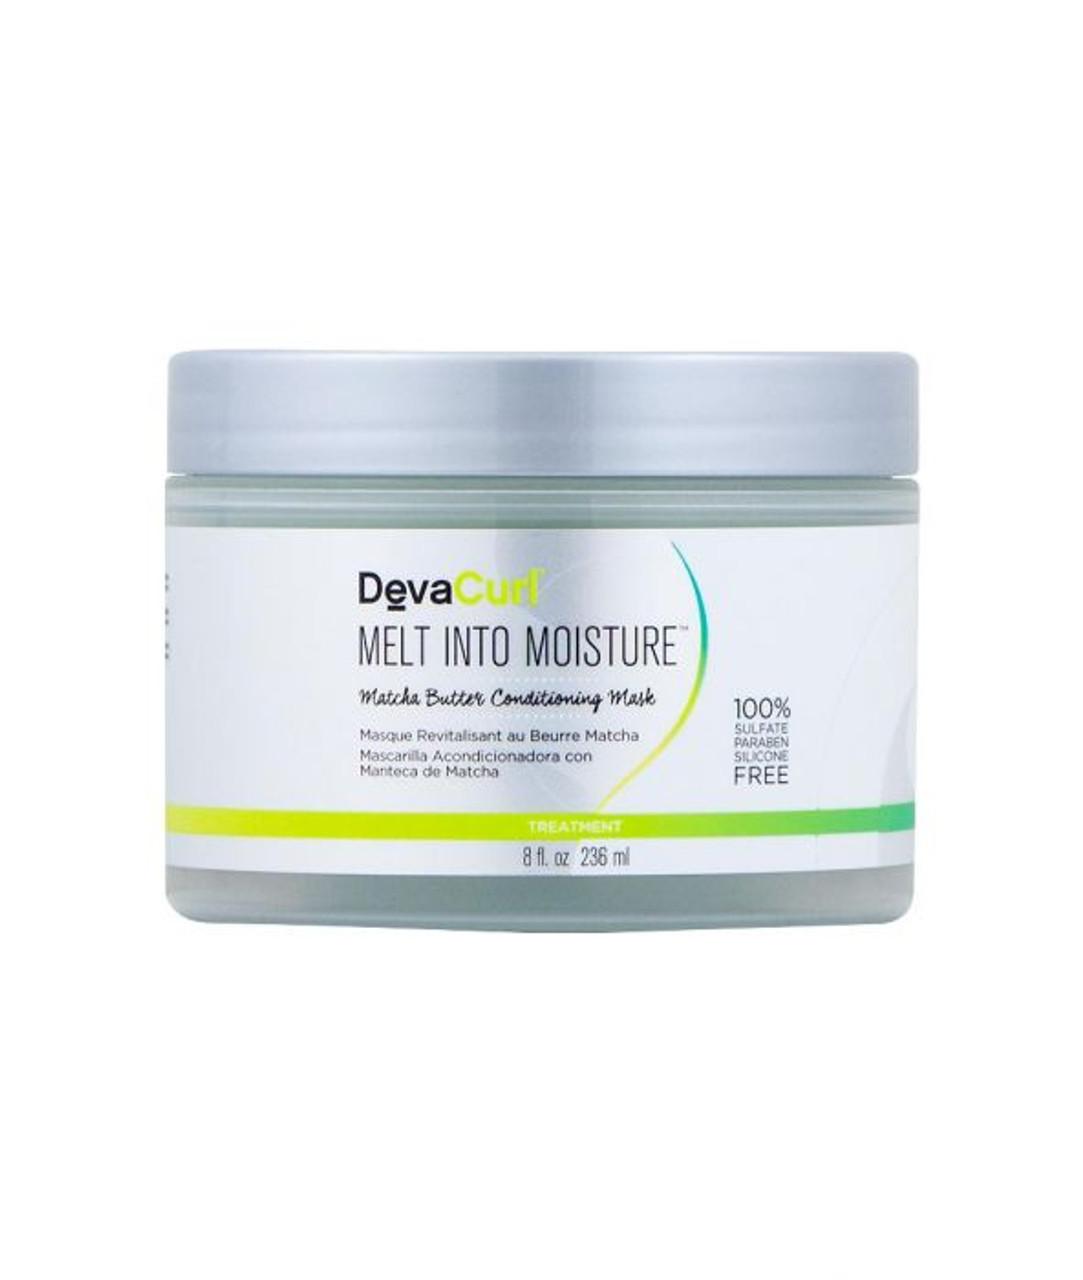 DevaCurl Melt Into Moisture 8 oz